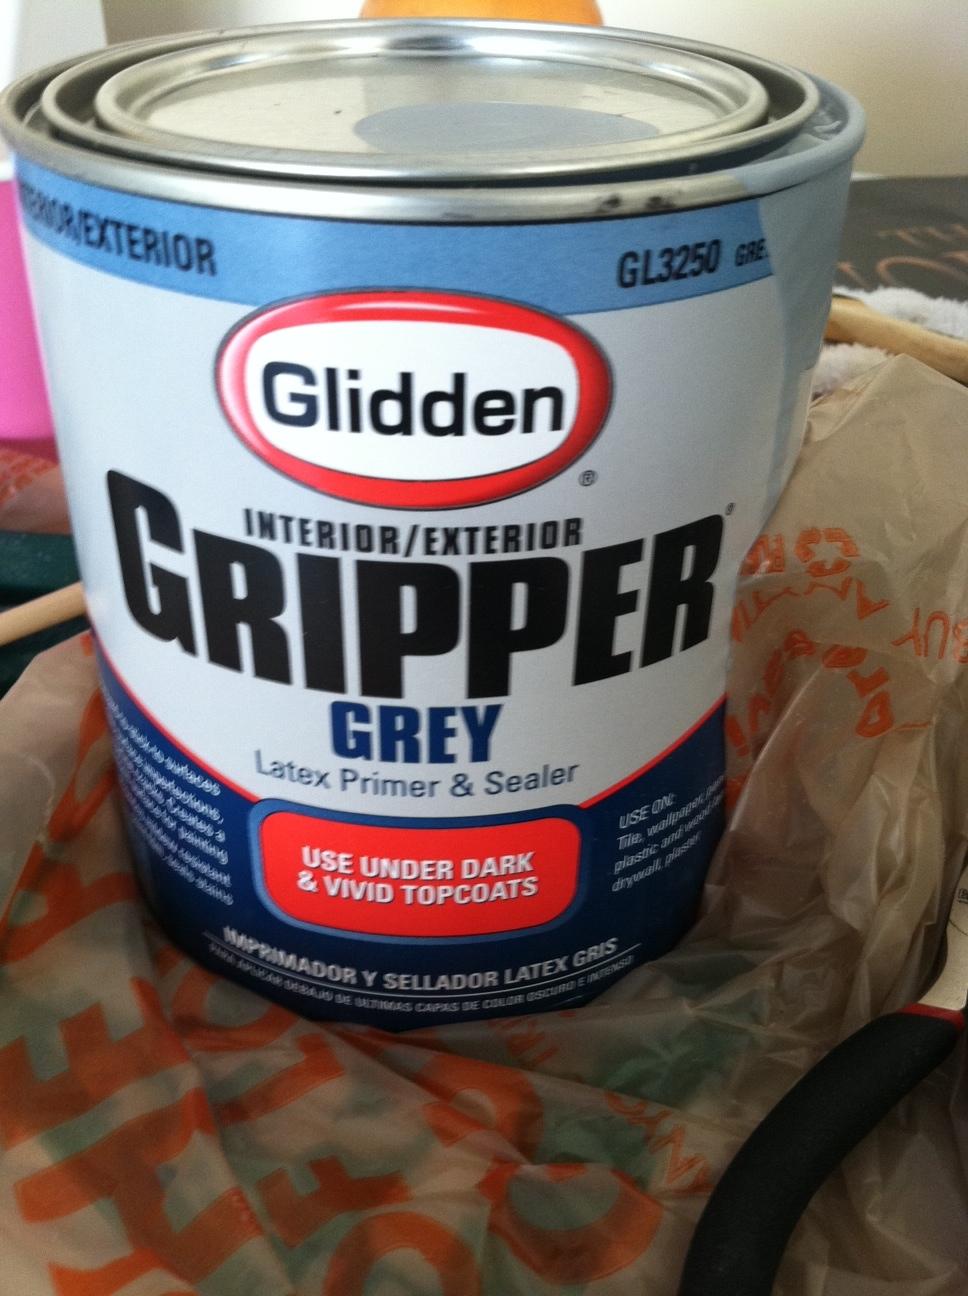 Glidden Gripper Sealer Primer Html In Qytajo Github Source Code Search Engine